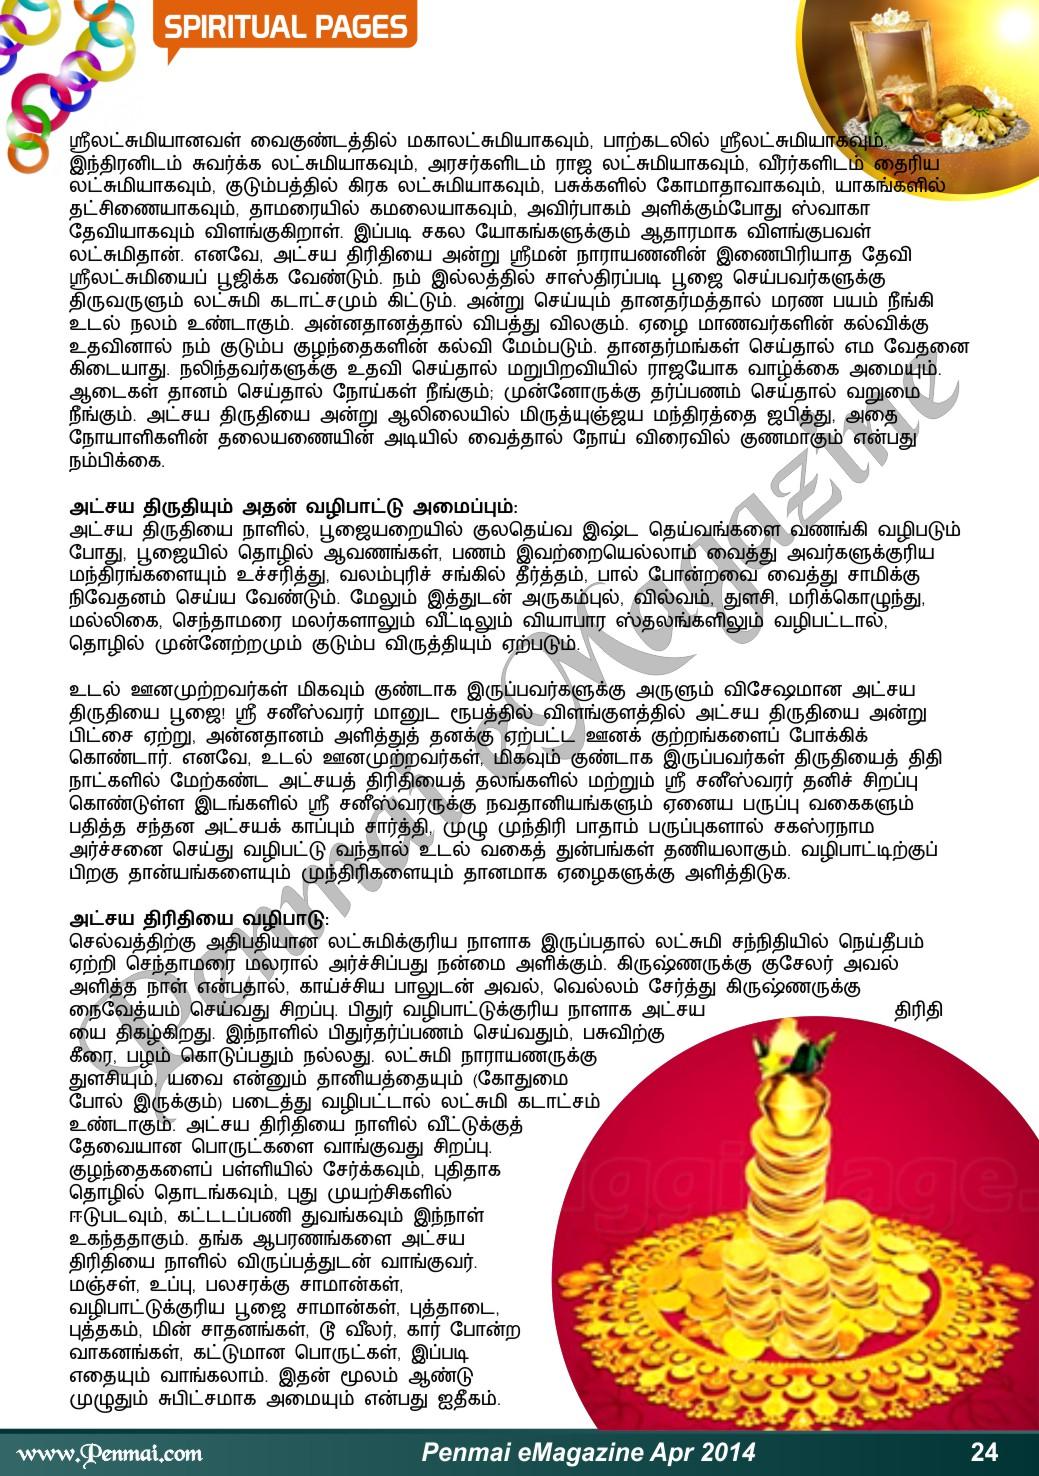 Name:  Penmai eMagazine April 2014-24.jpg Views: 364 Size:  585.5 KB